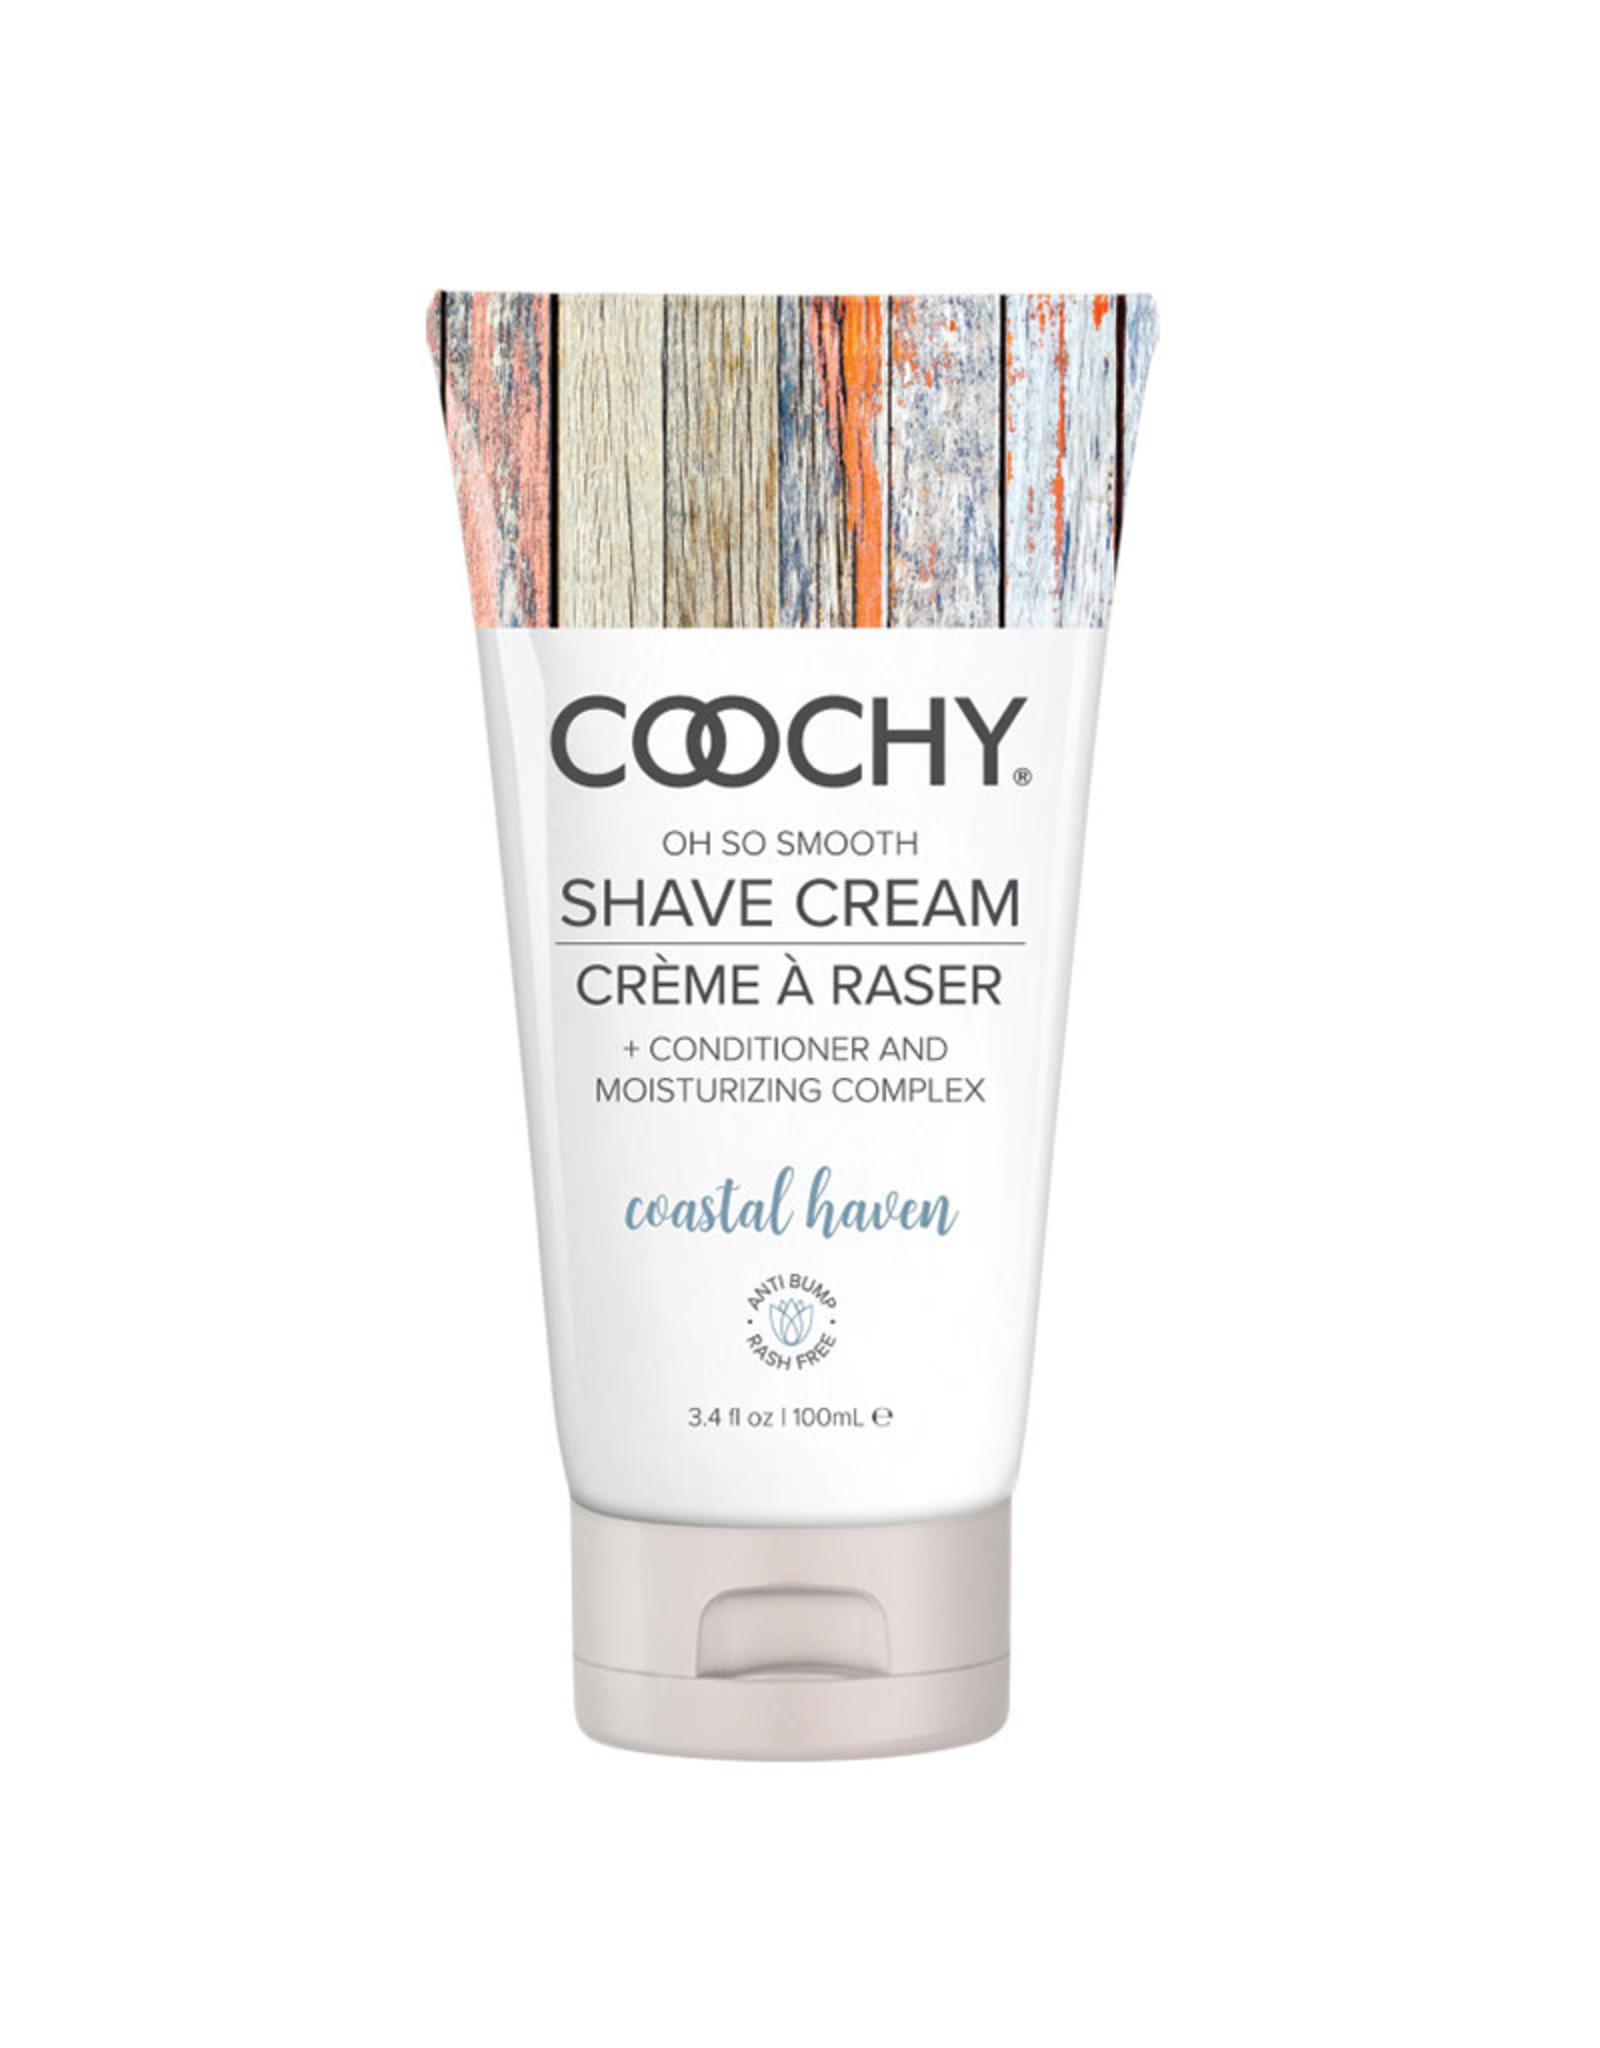 Coochy Coochy - Coastal Haven (3.4 oz)